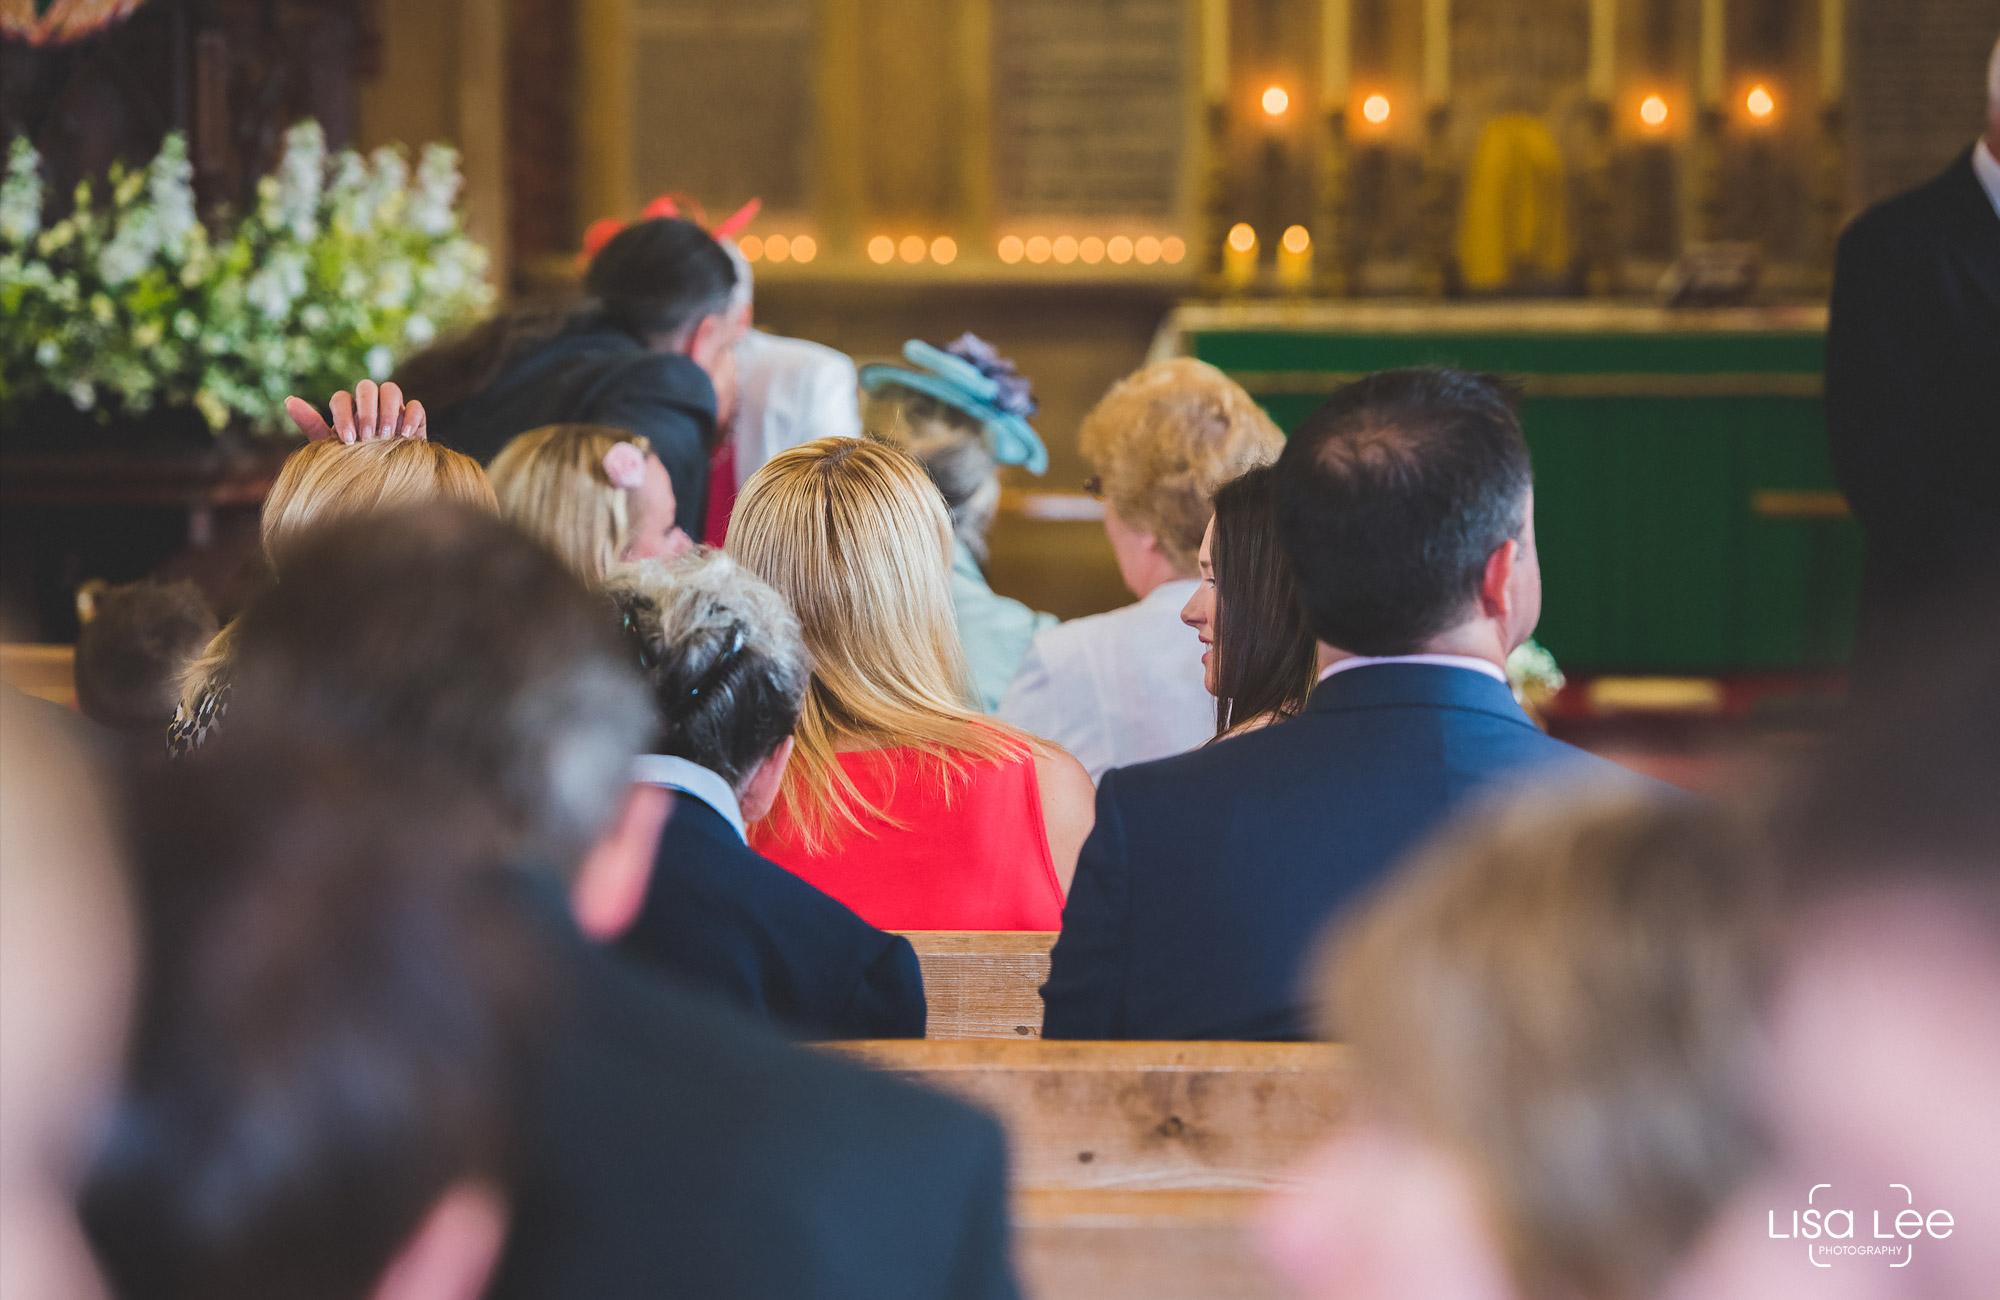 lisa-lee-wedding-photography-burton-guests.jpg